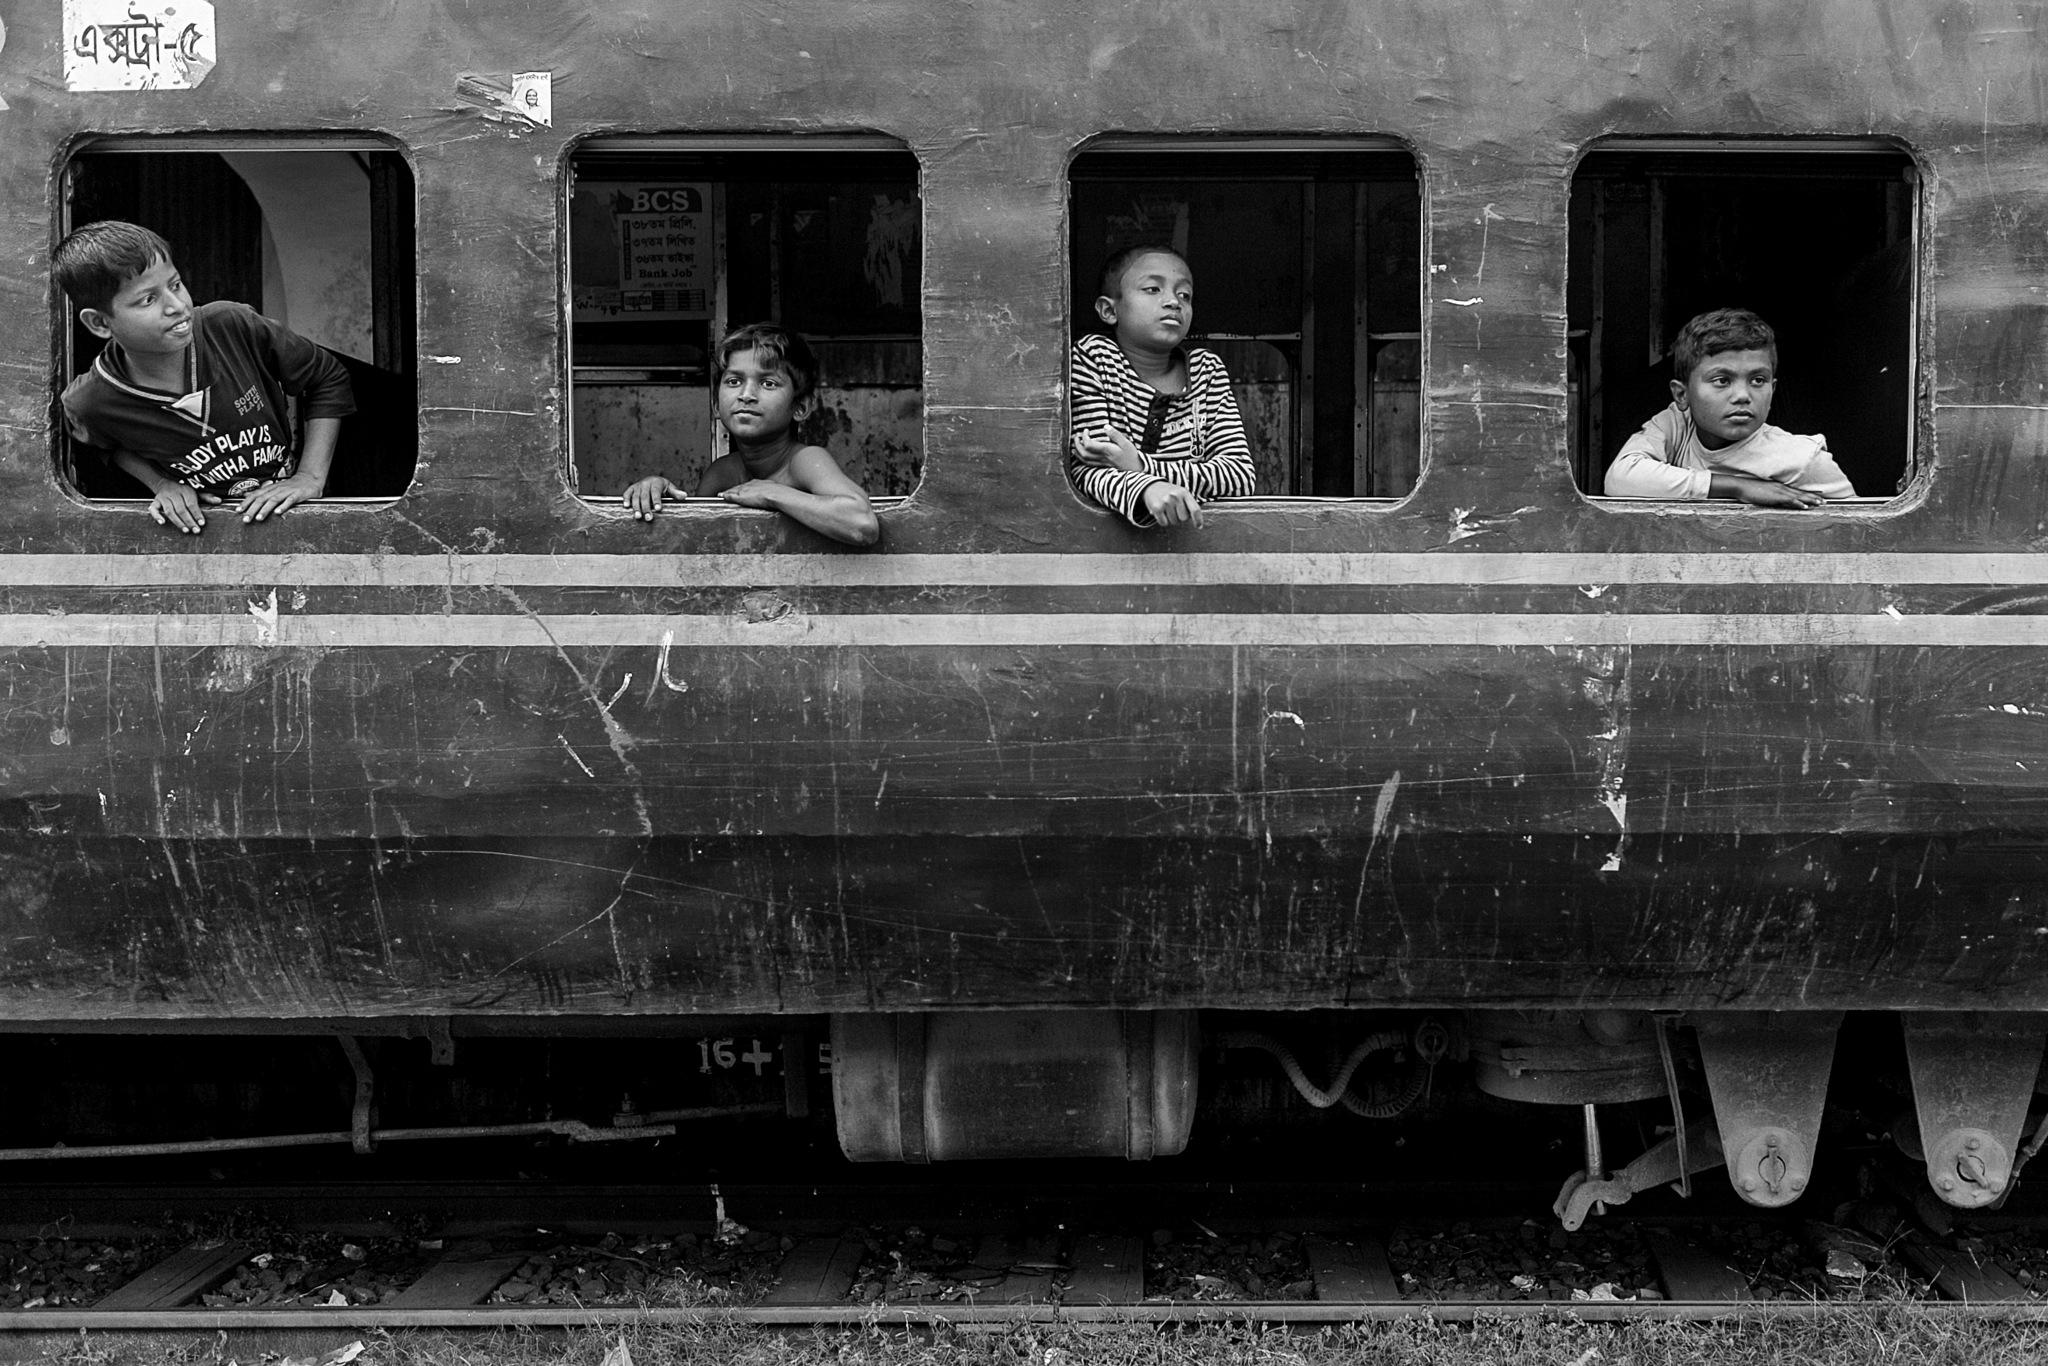 Train Windows by Mahesh Krishnamurthy